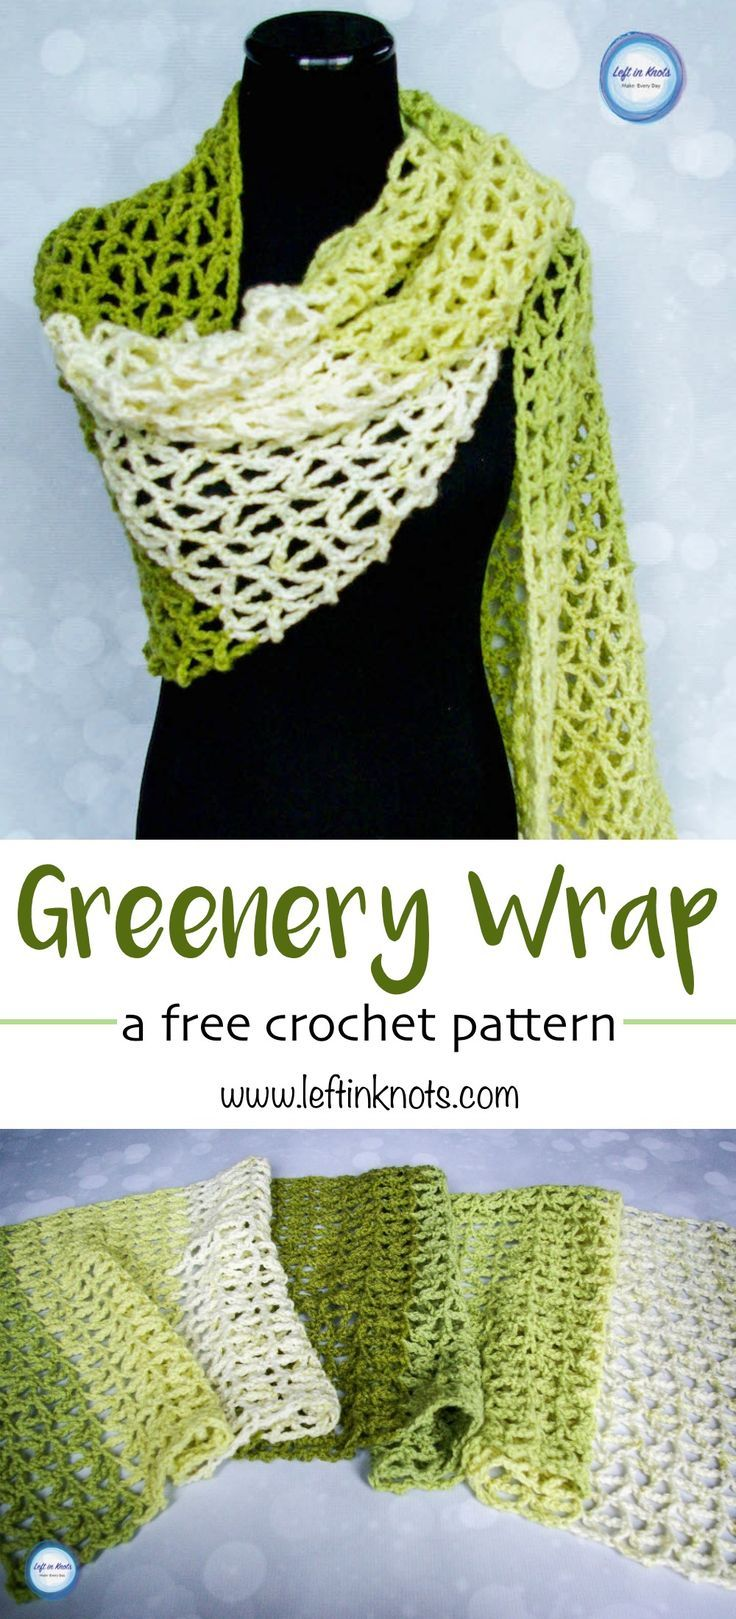 Greenery Wrap | Pinterest | Modern crochet patterns, Modern crochet ...